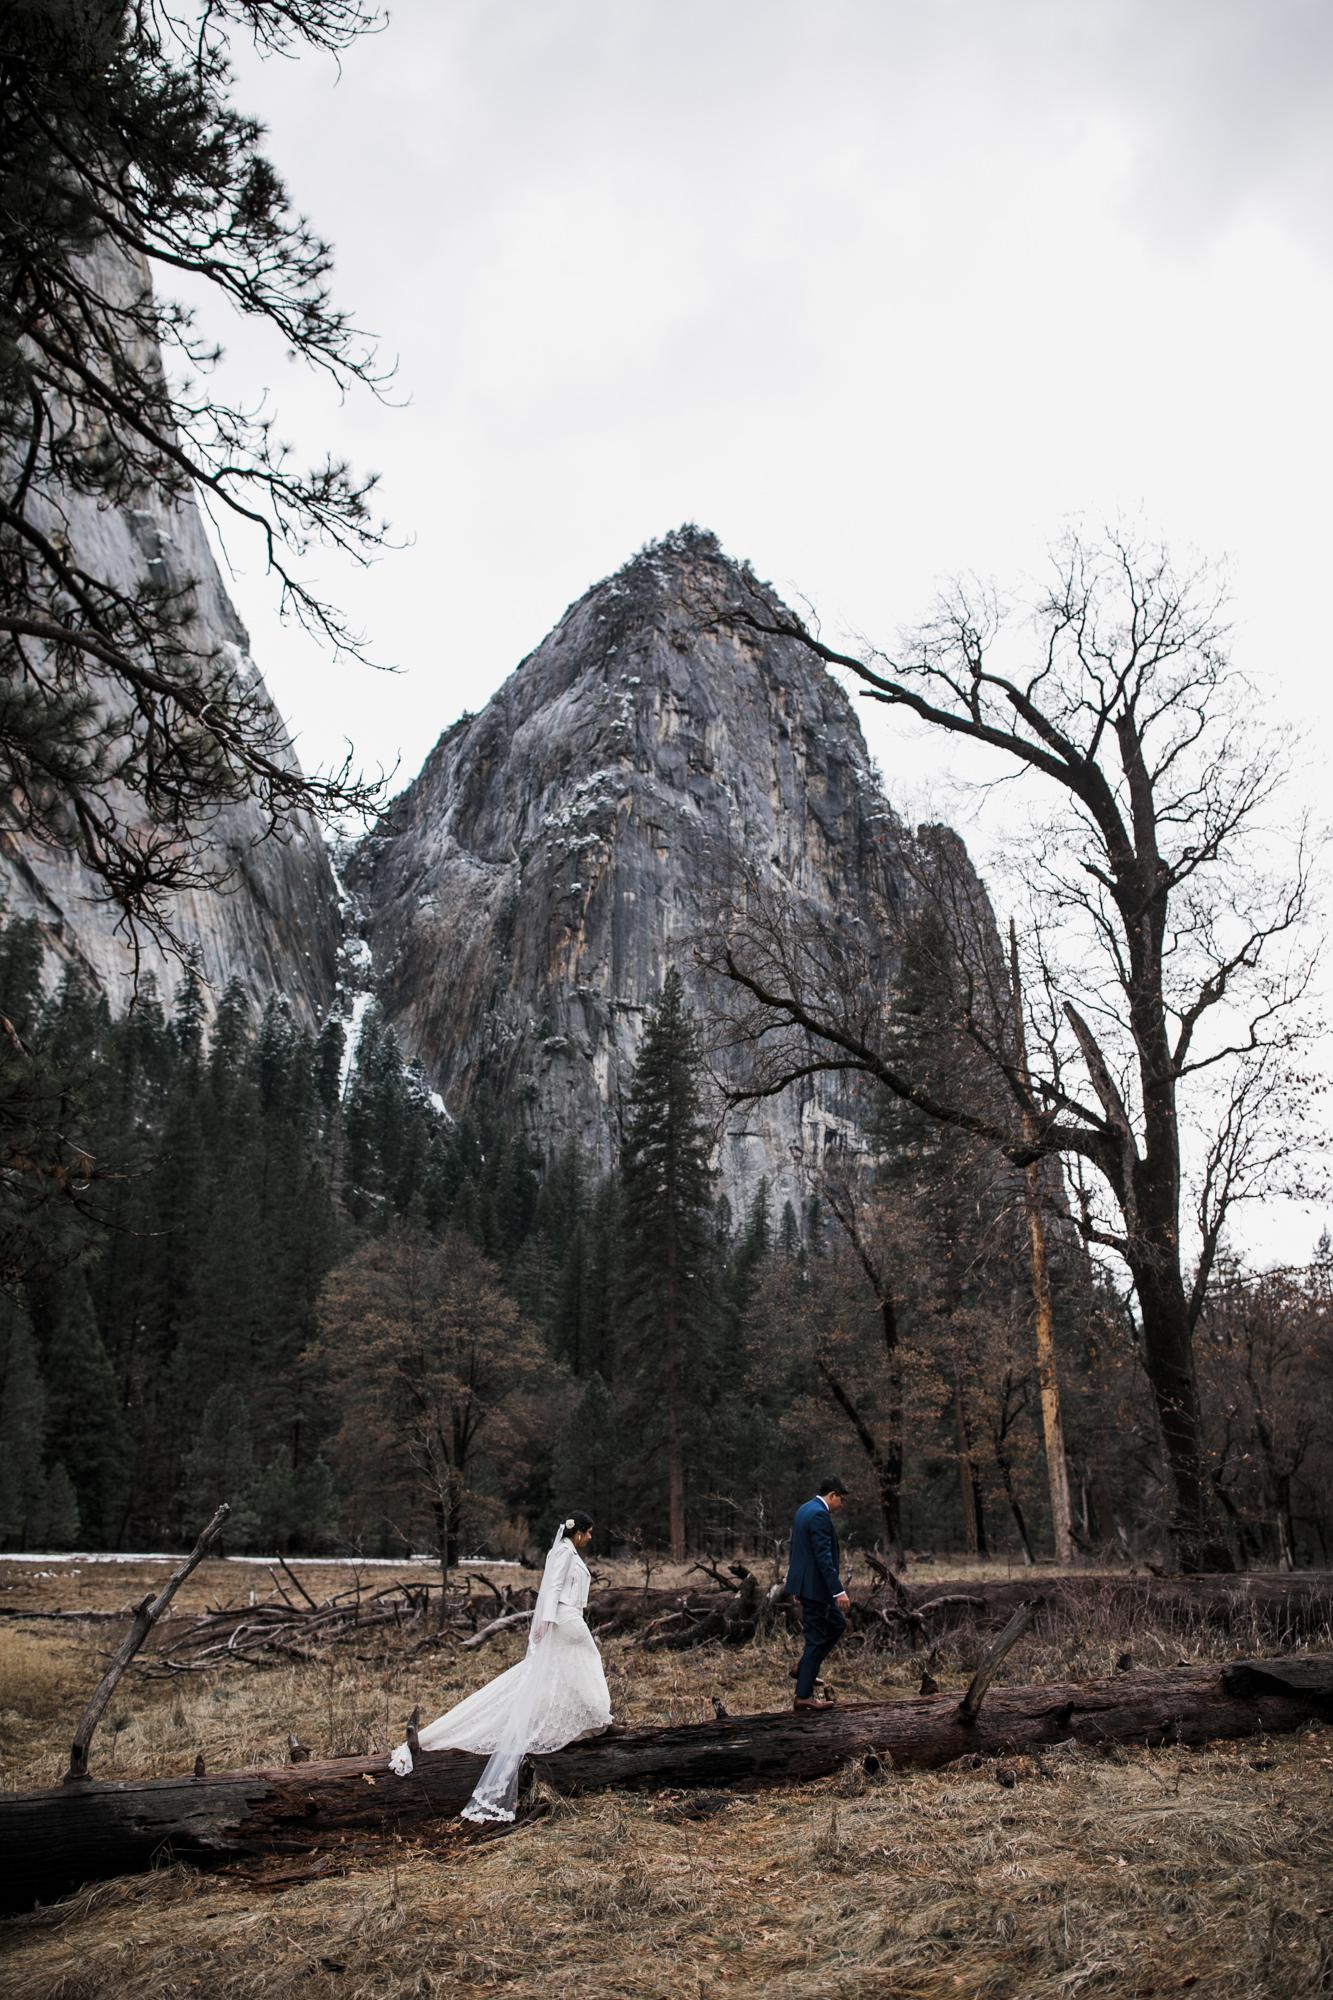 adventurous wedding photos in yosemite